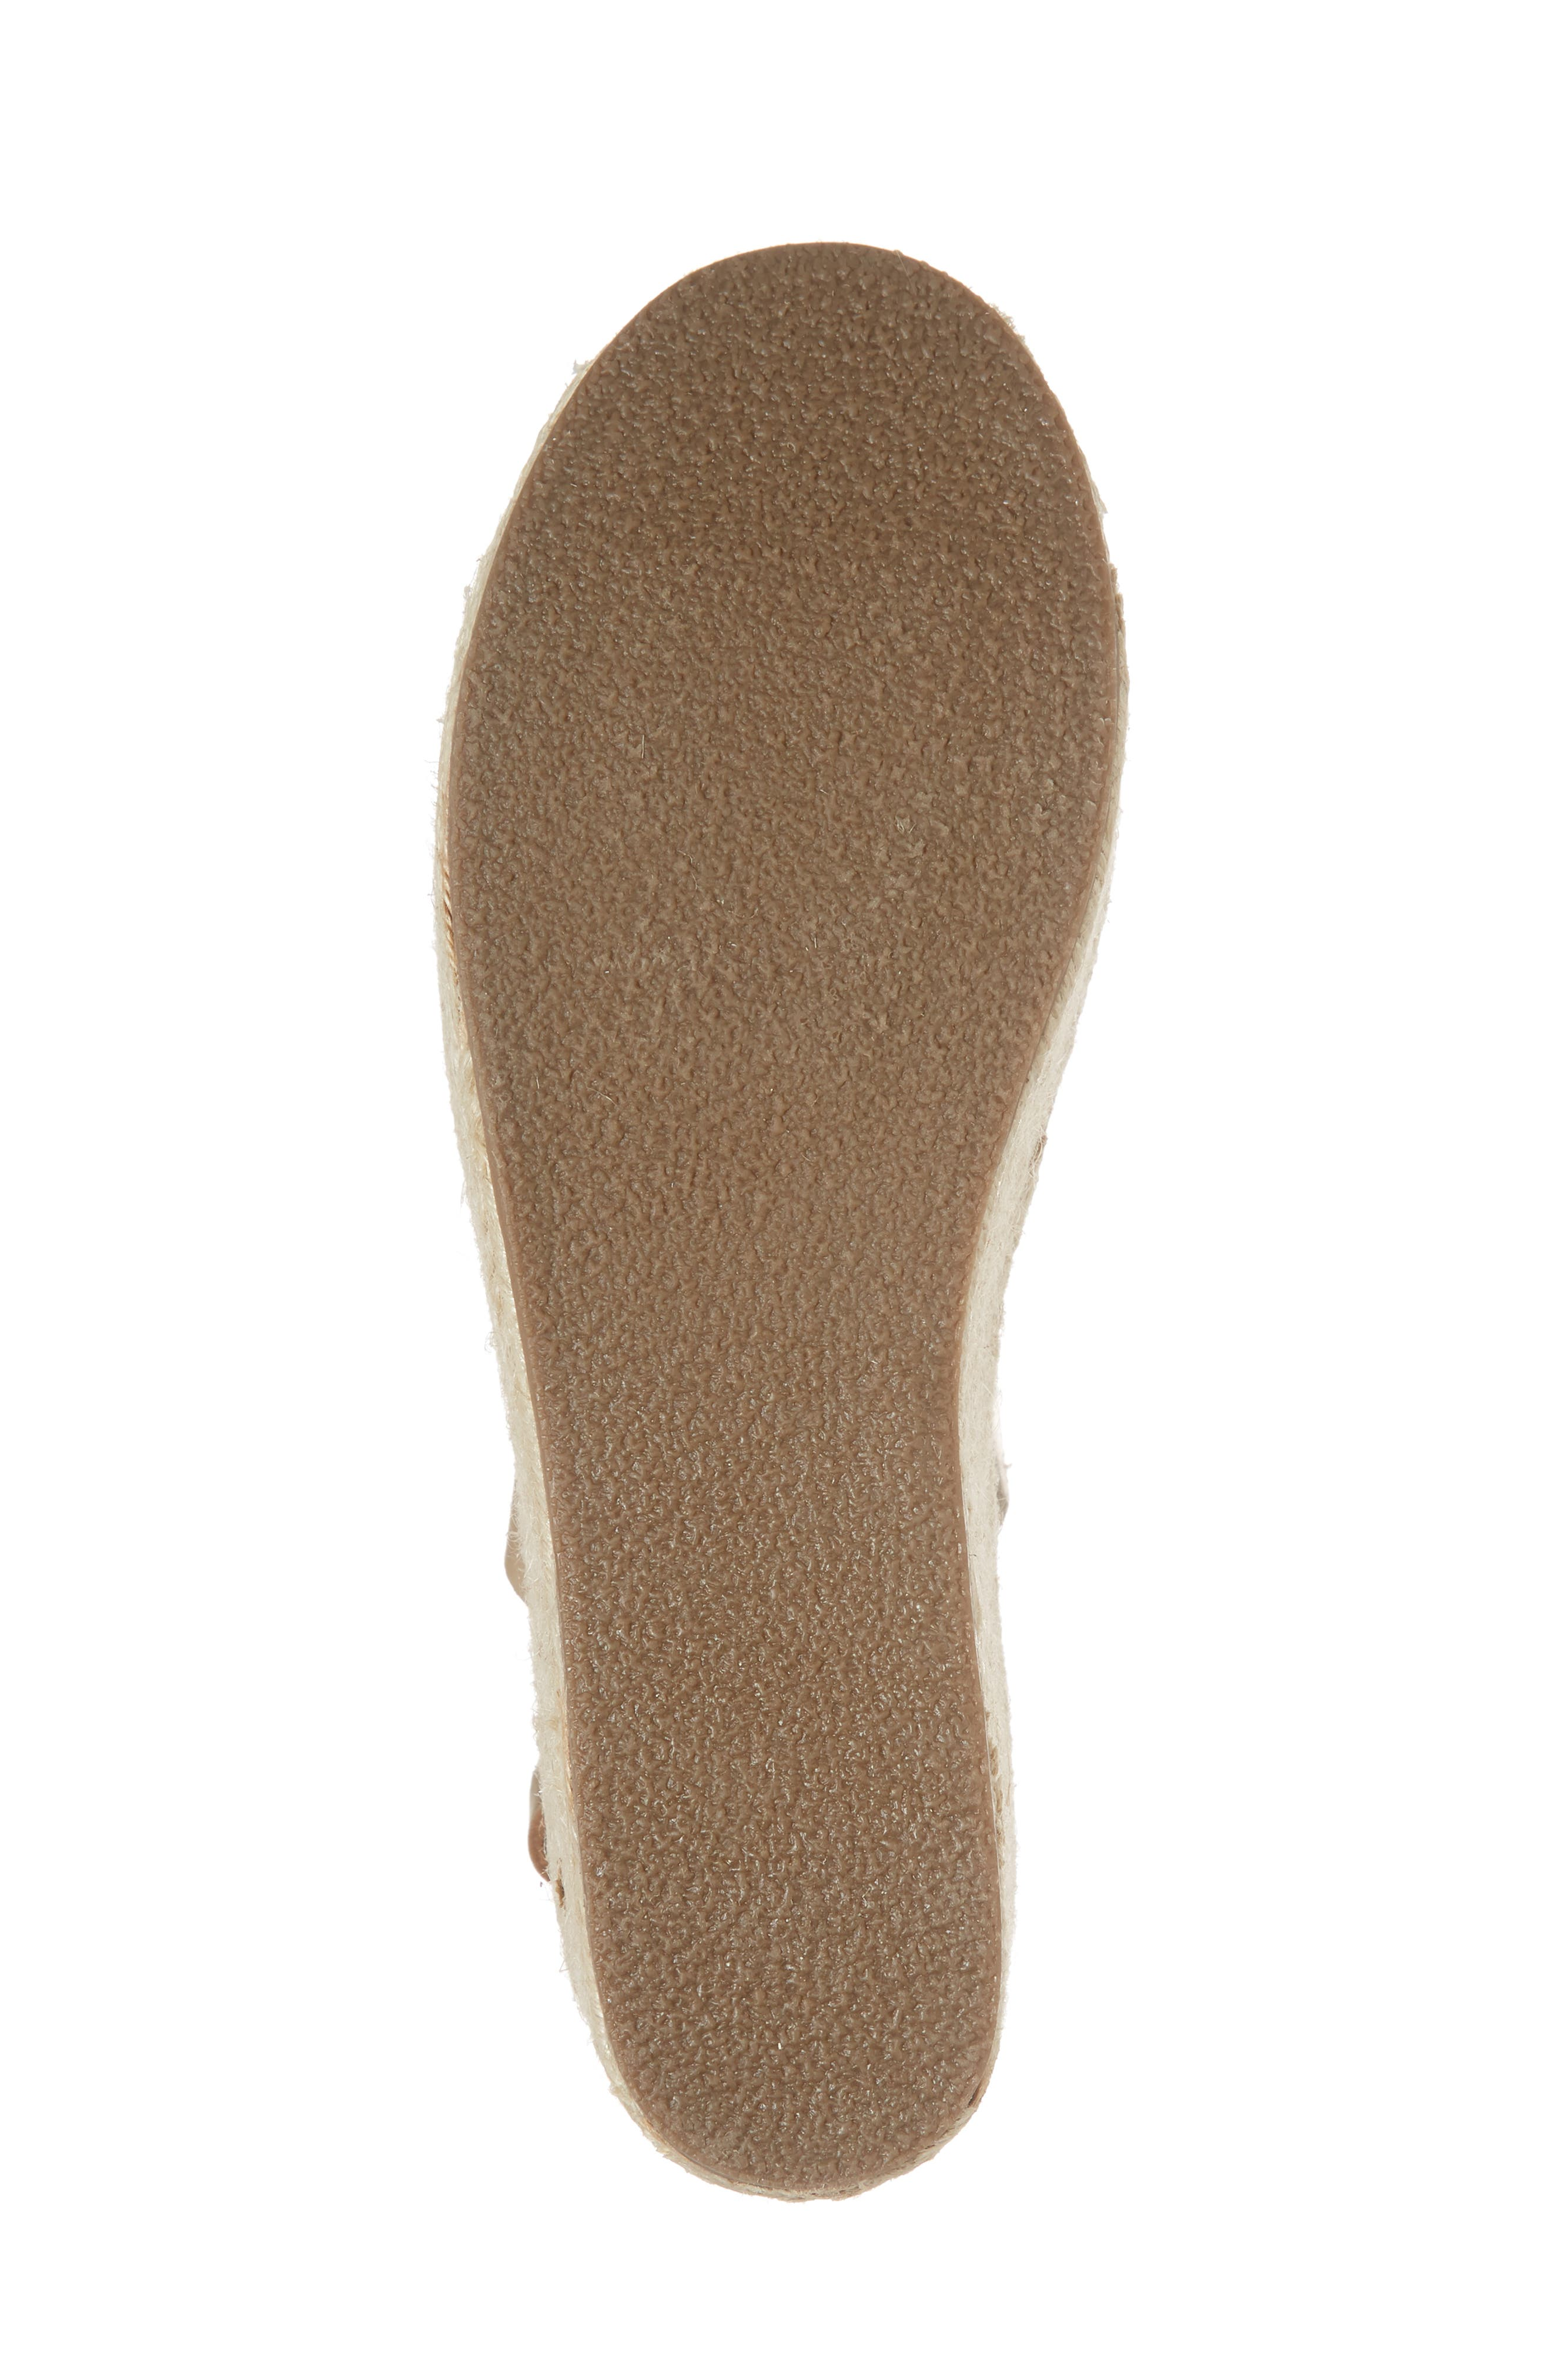 Cali Espadrille Platform Sandal,                             Alternate thumbnail 18, color,